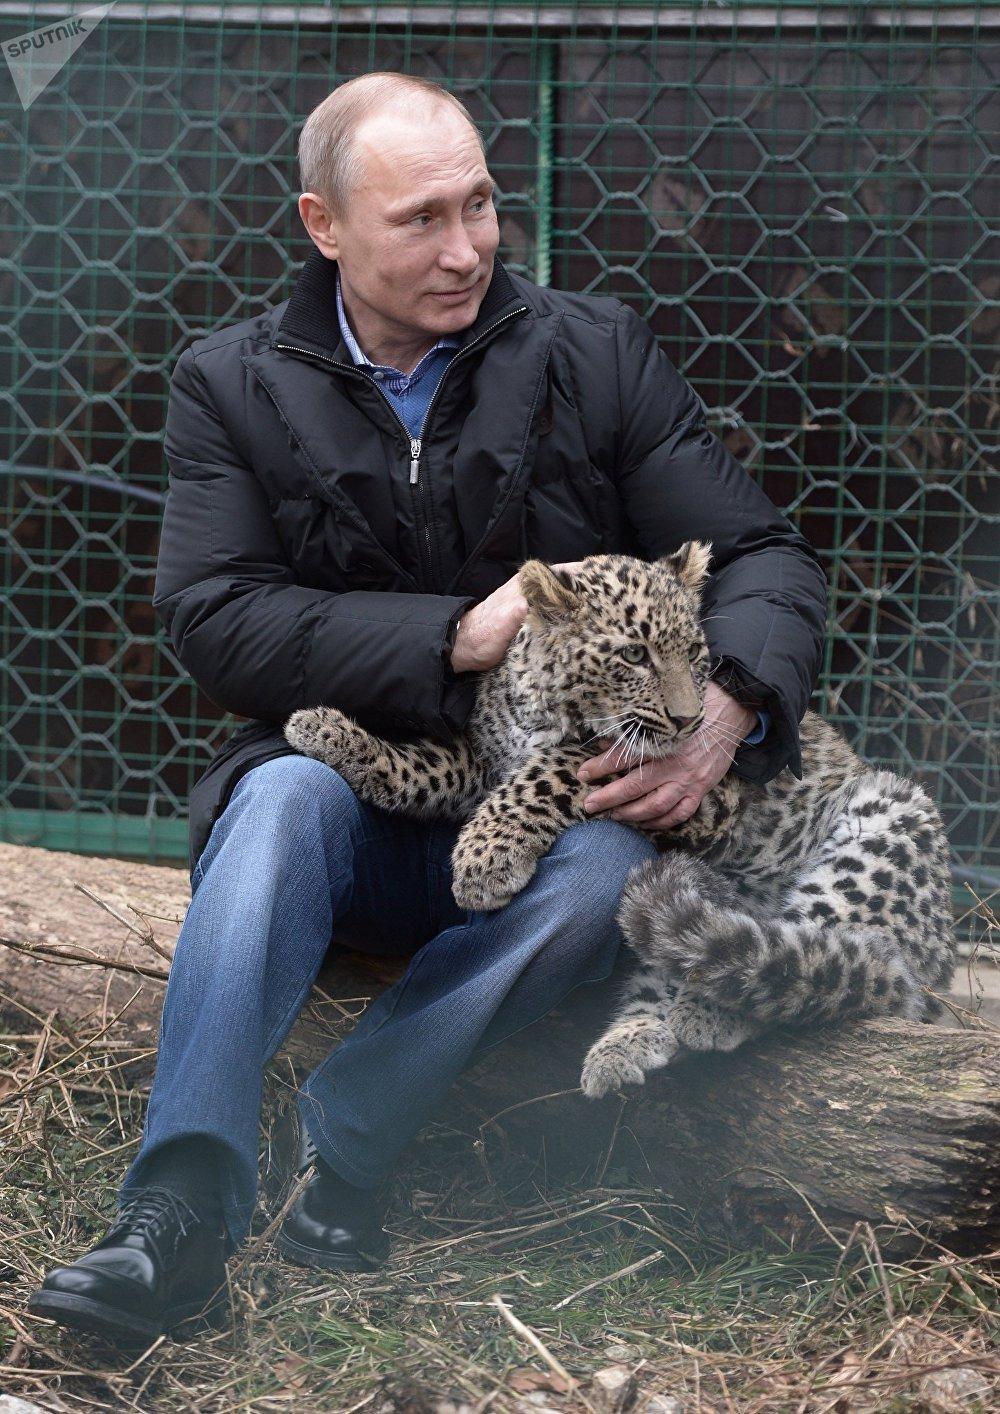 Vladímir Putin con un cachorro de leopardo (2014)